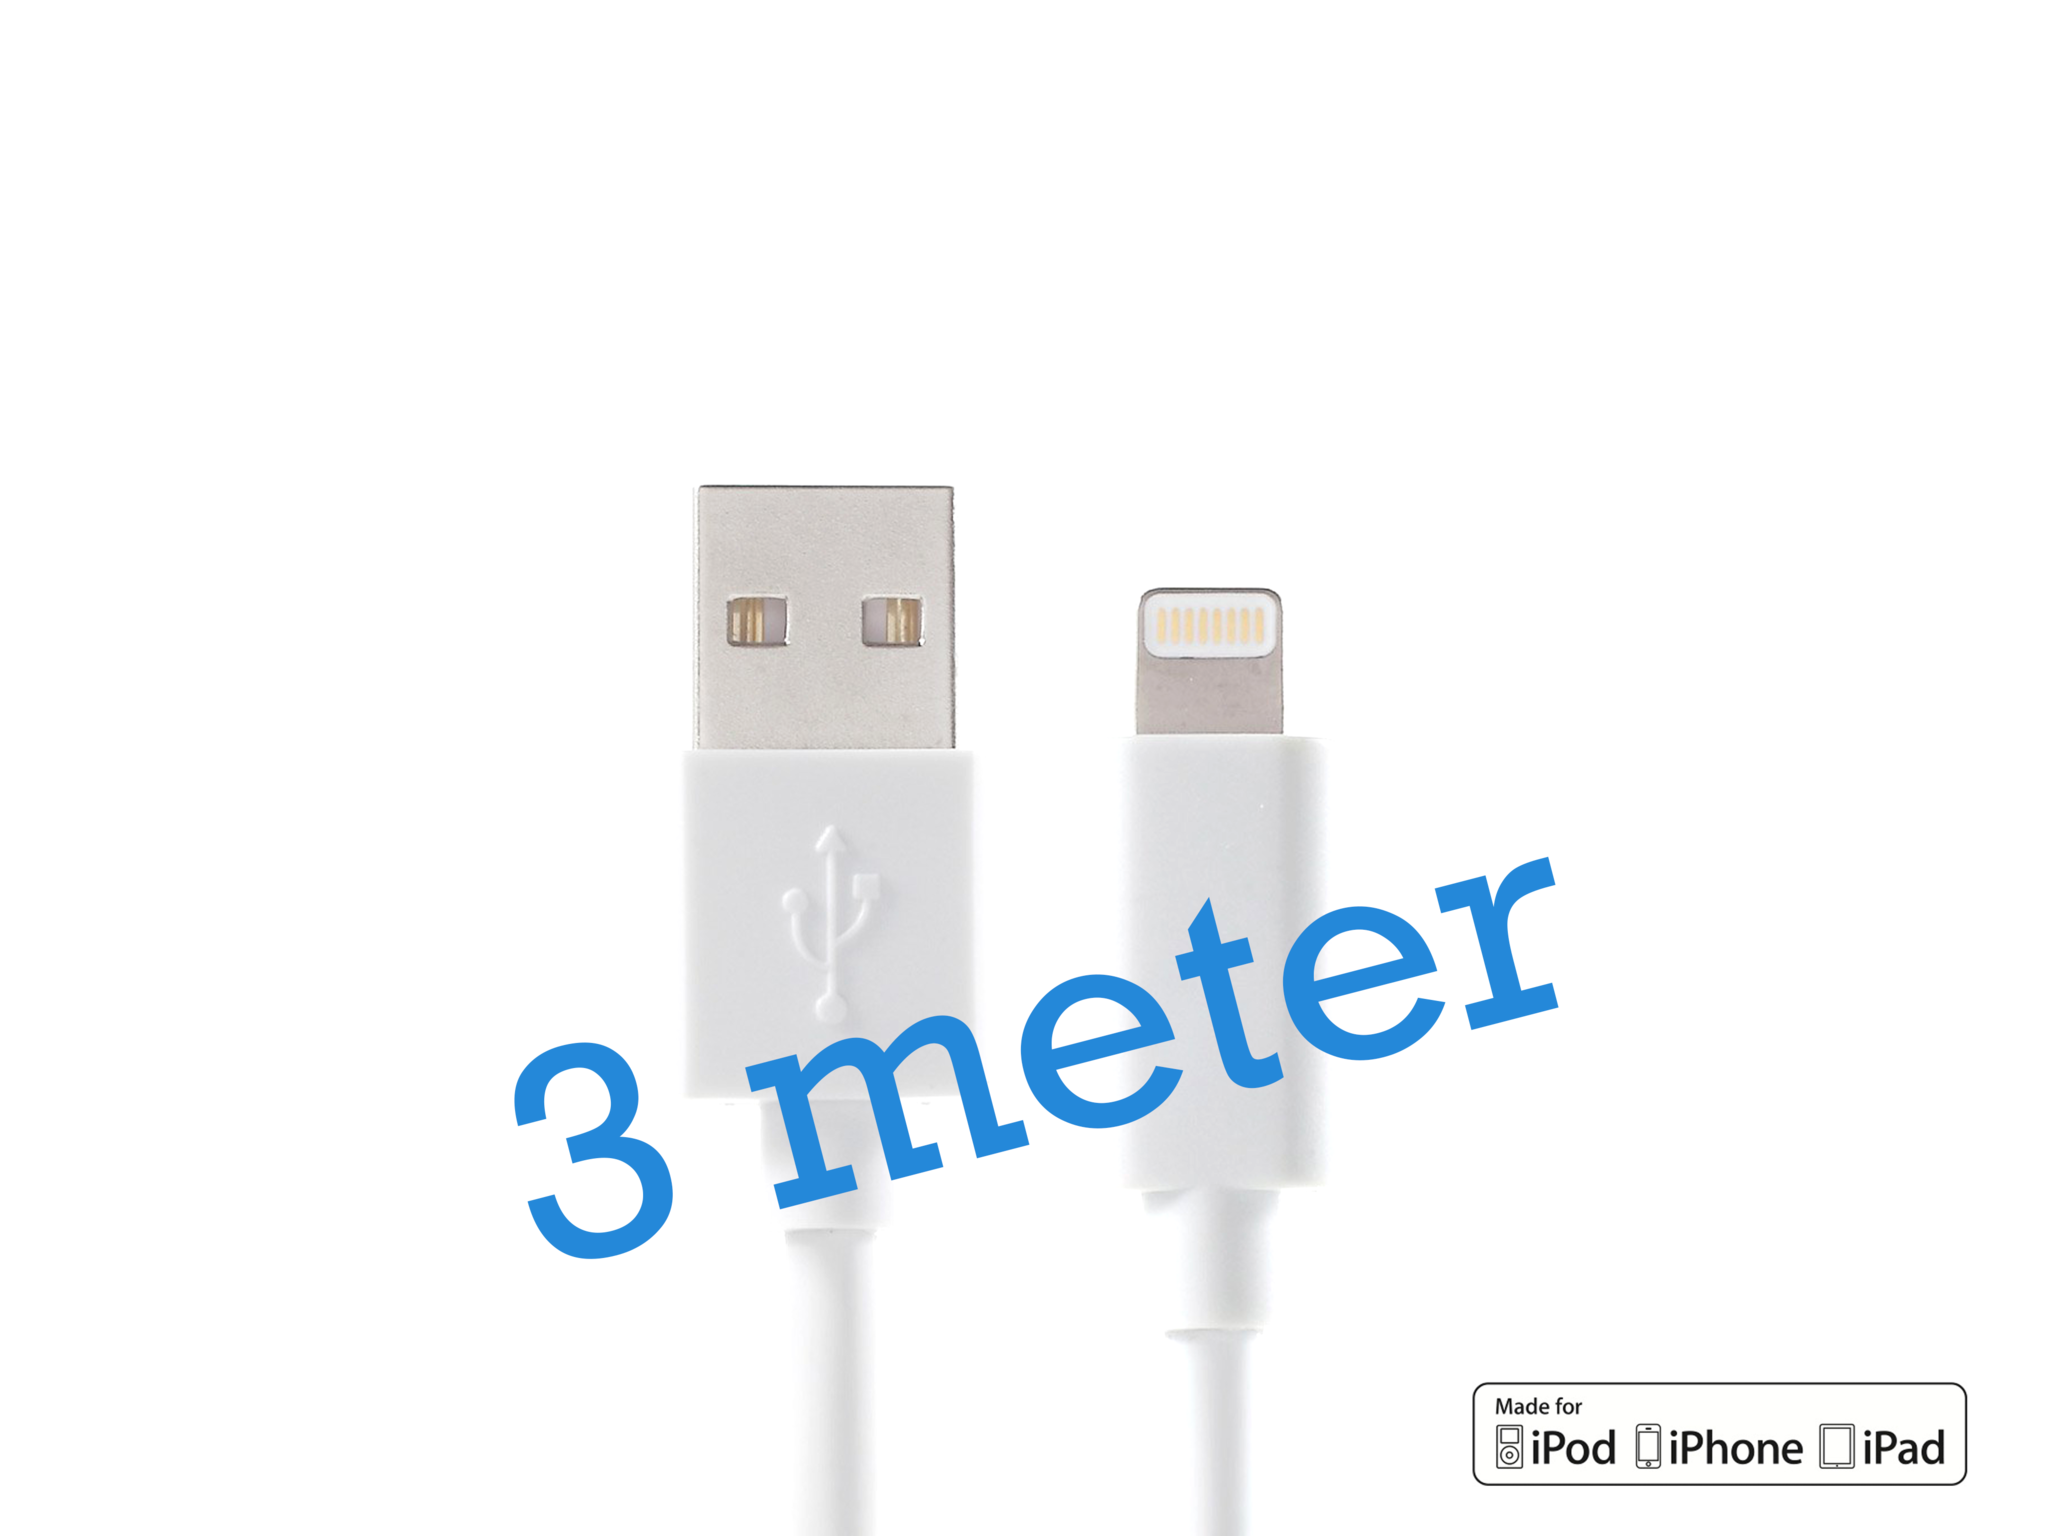 iPhone kabel 3 meter